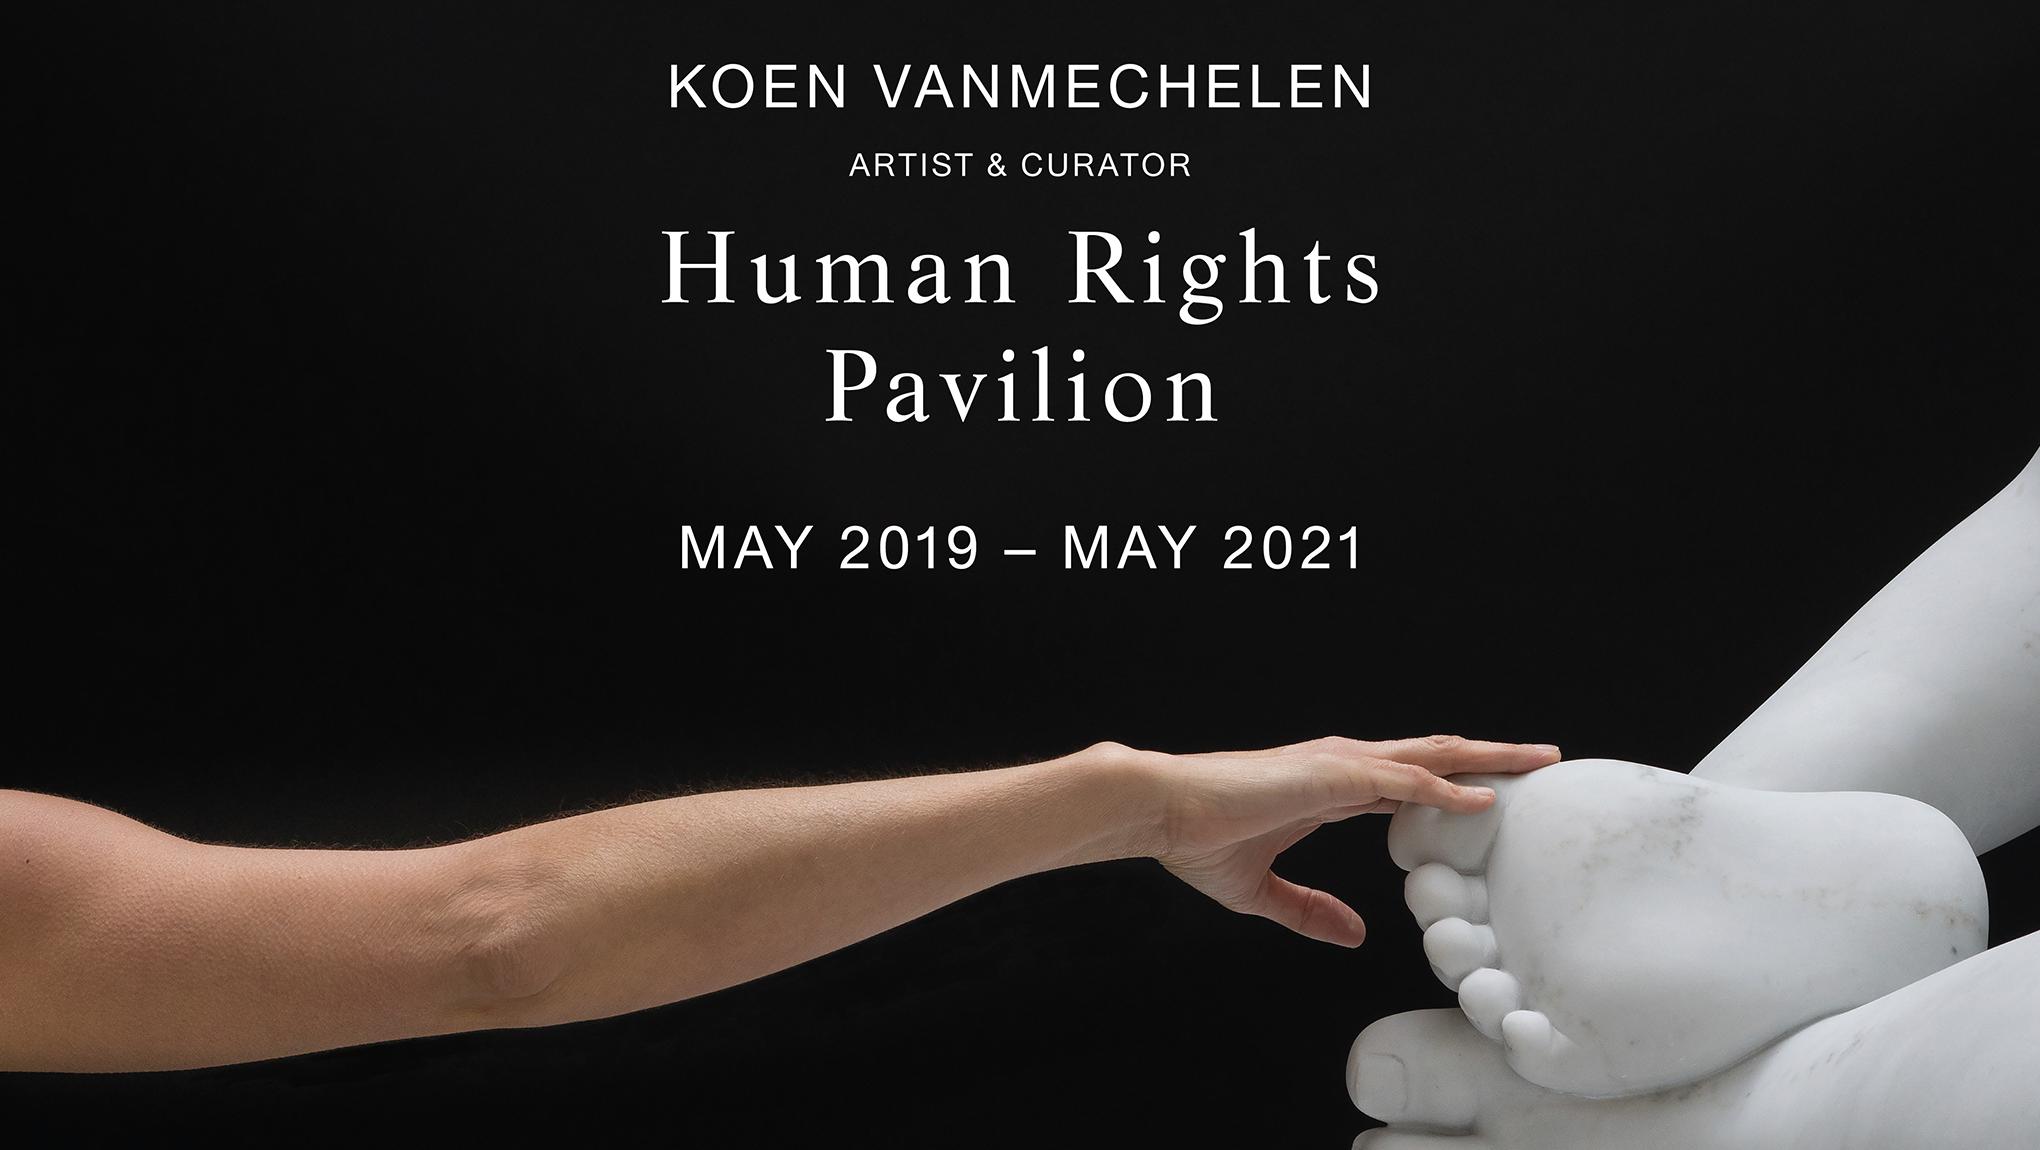 Human Rights Pavilion